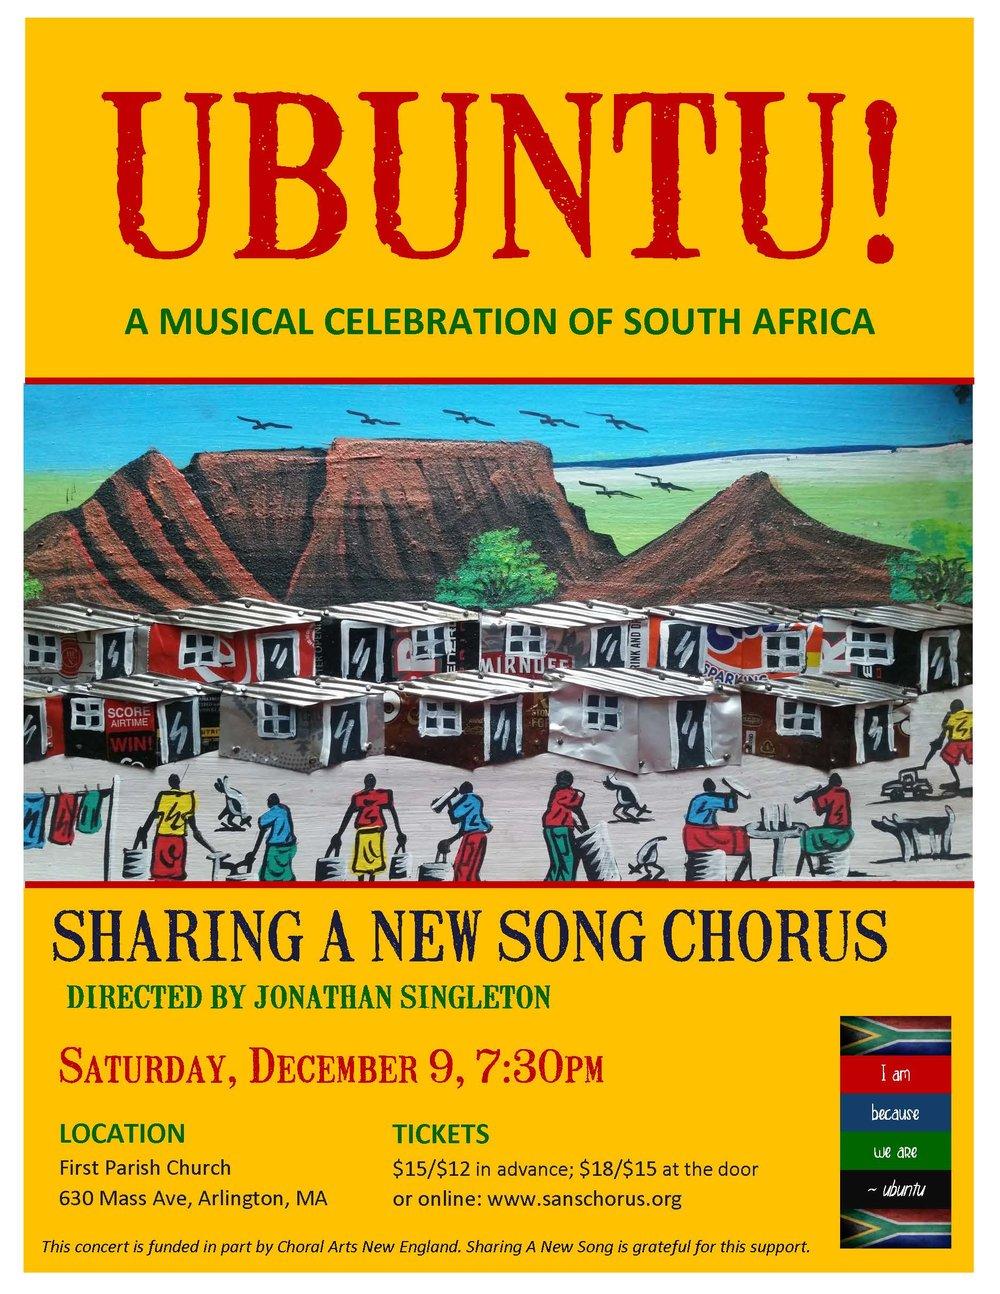 SANS December 9, 2017 Concert Flyer.jpg